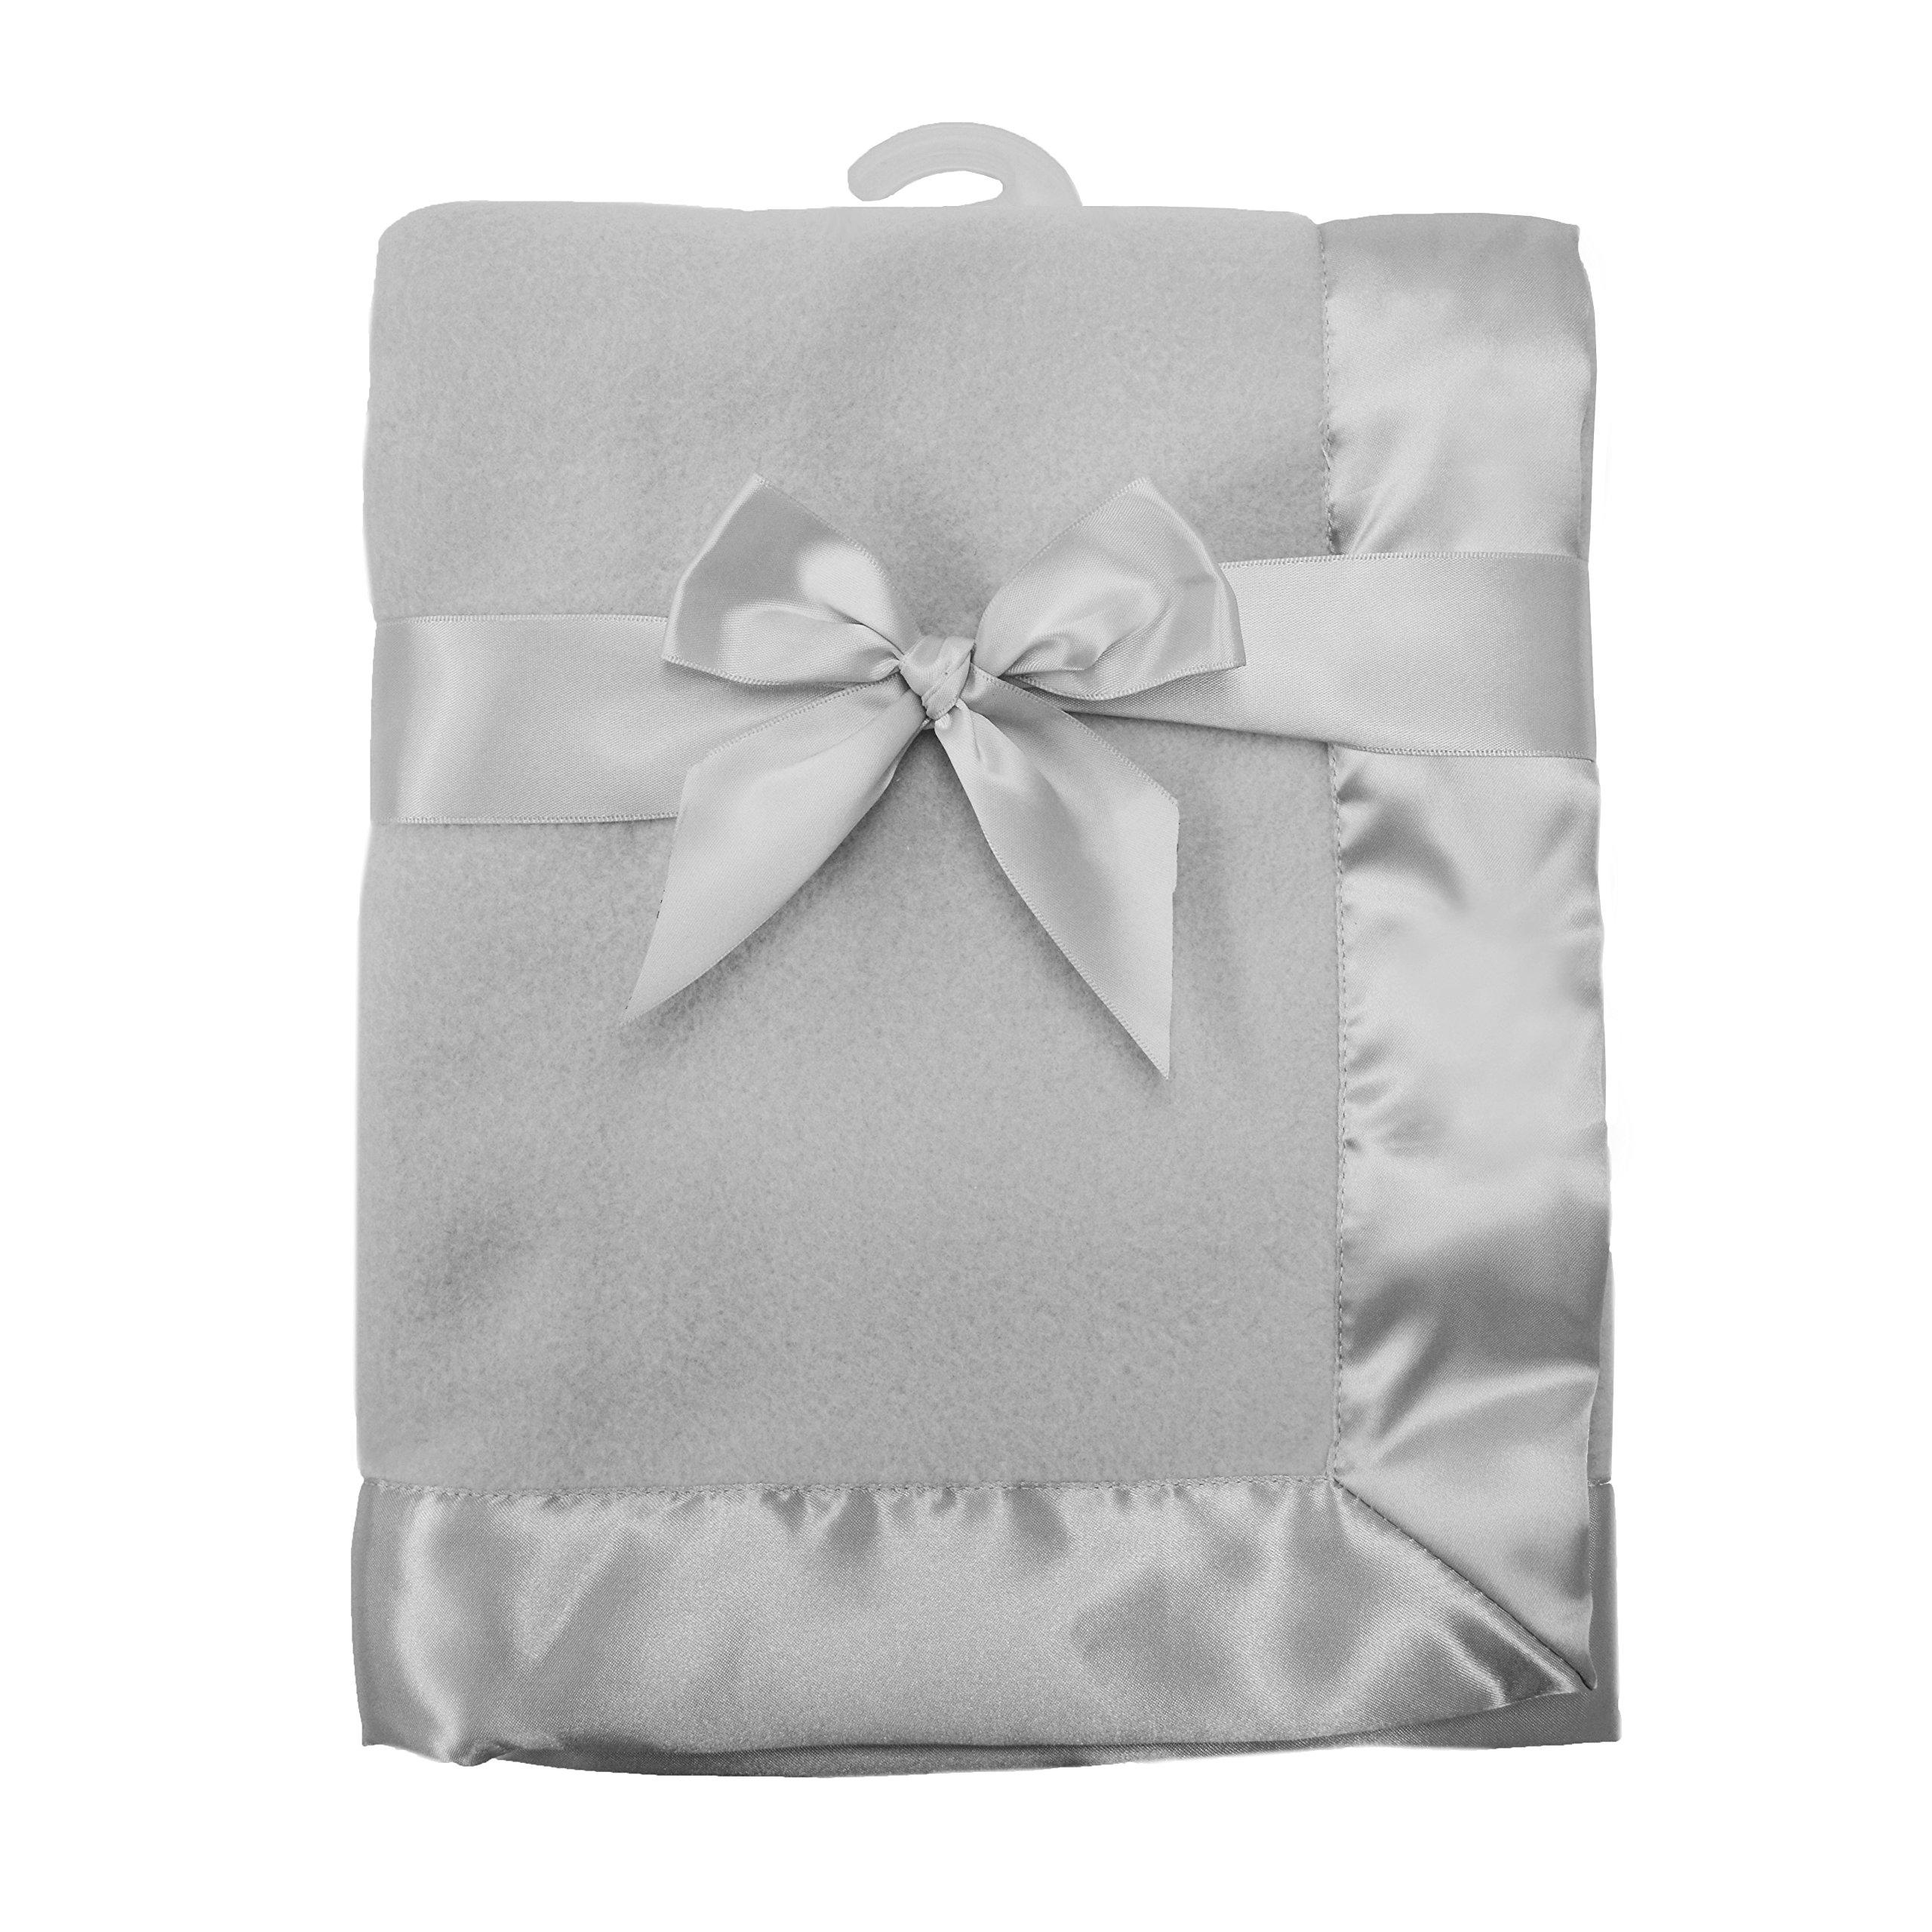 "American Baby Company Fleece Blanket 30"" X 40"" with 2"" Satin Trim, Grey"